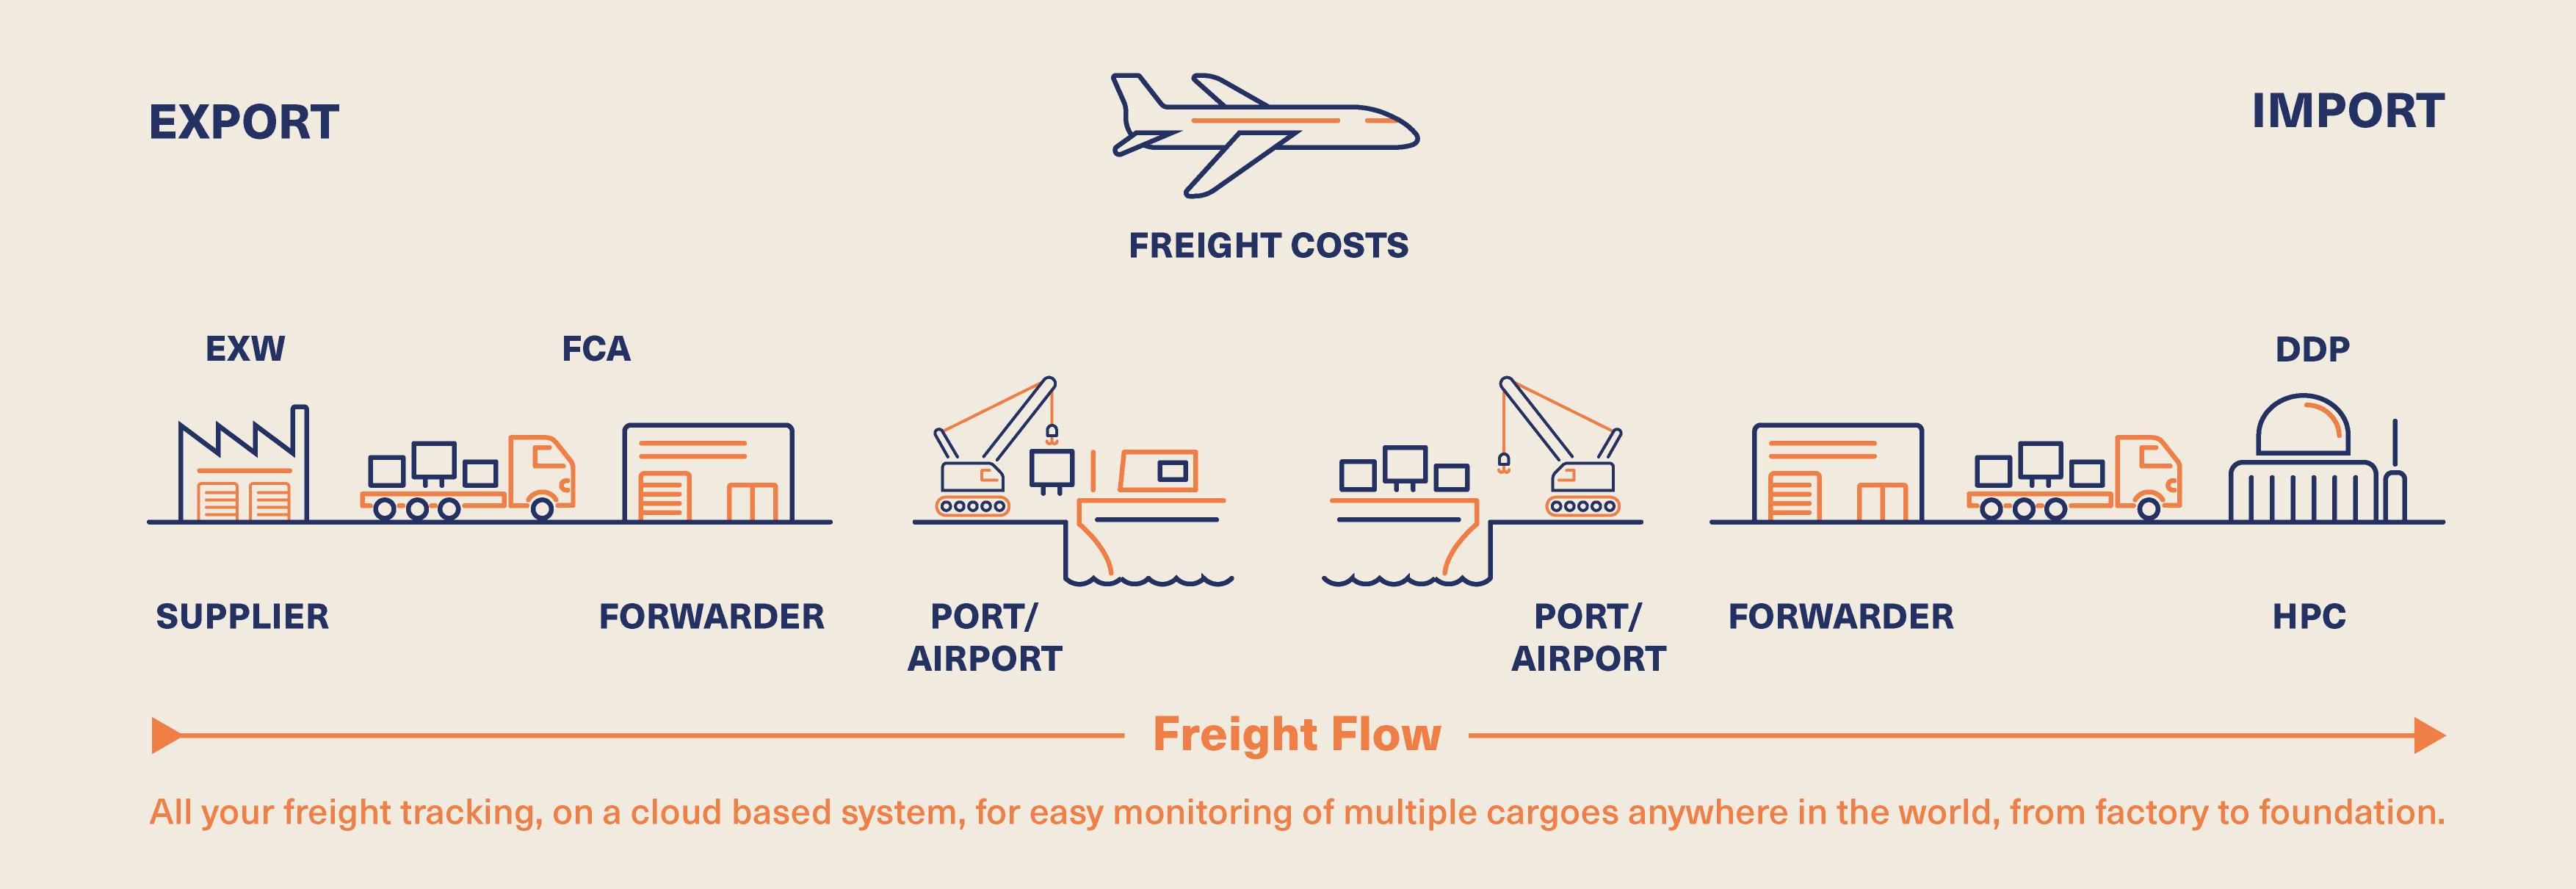 Freight Forwarding Diagram